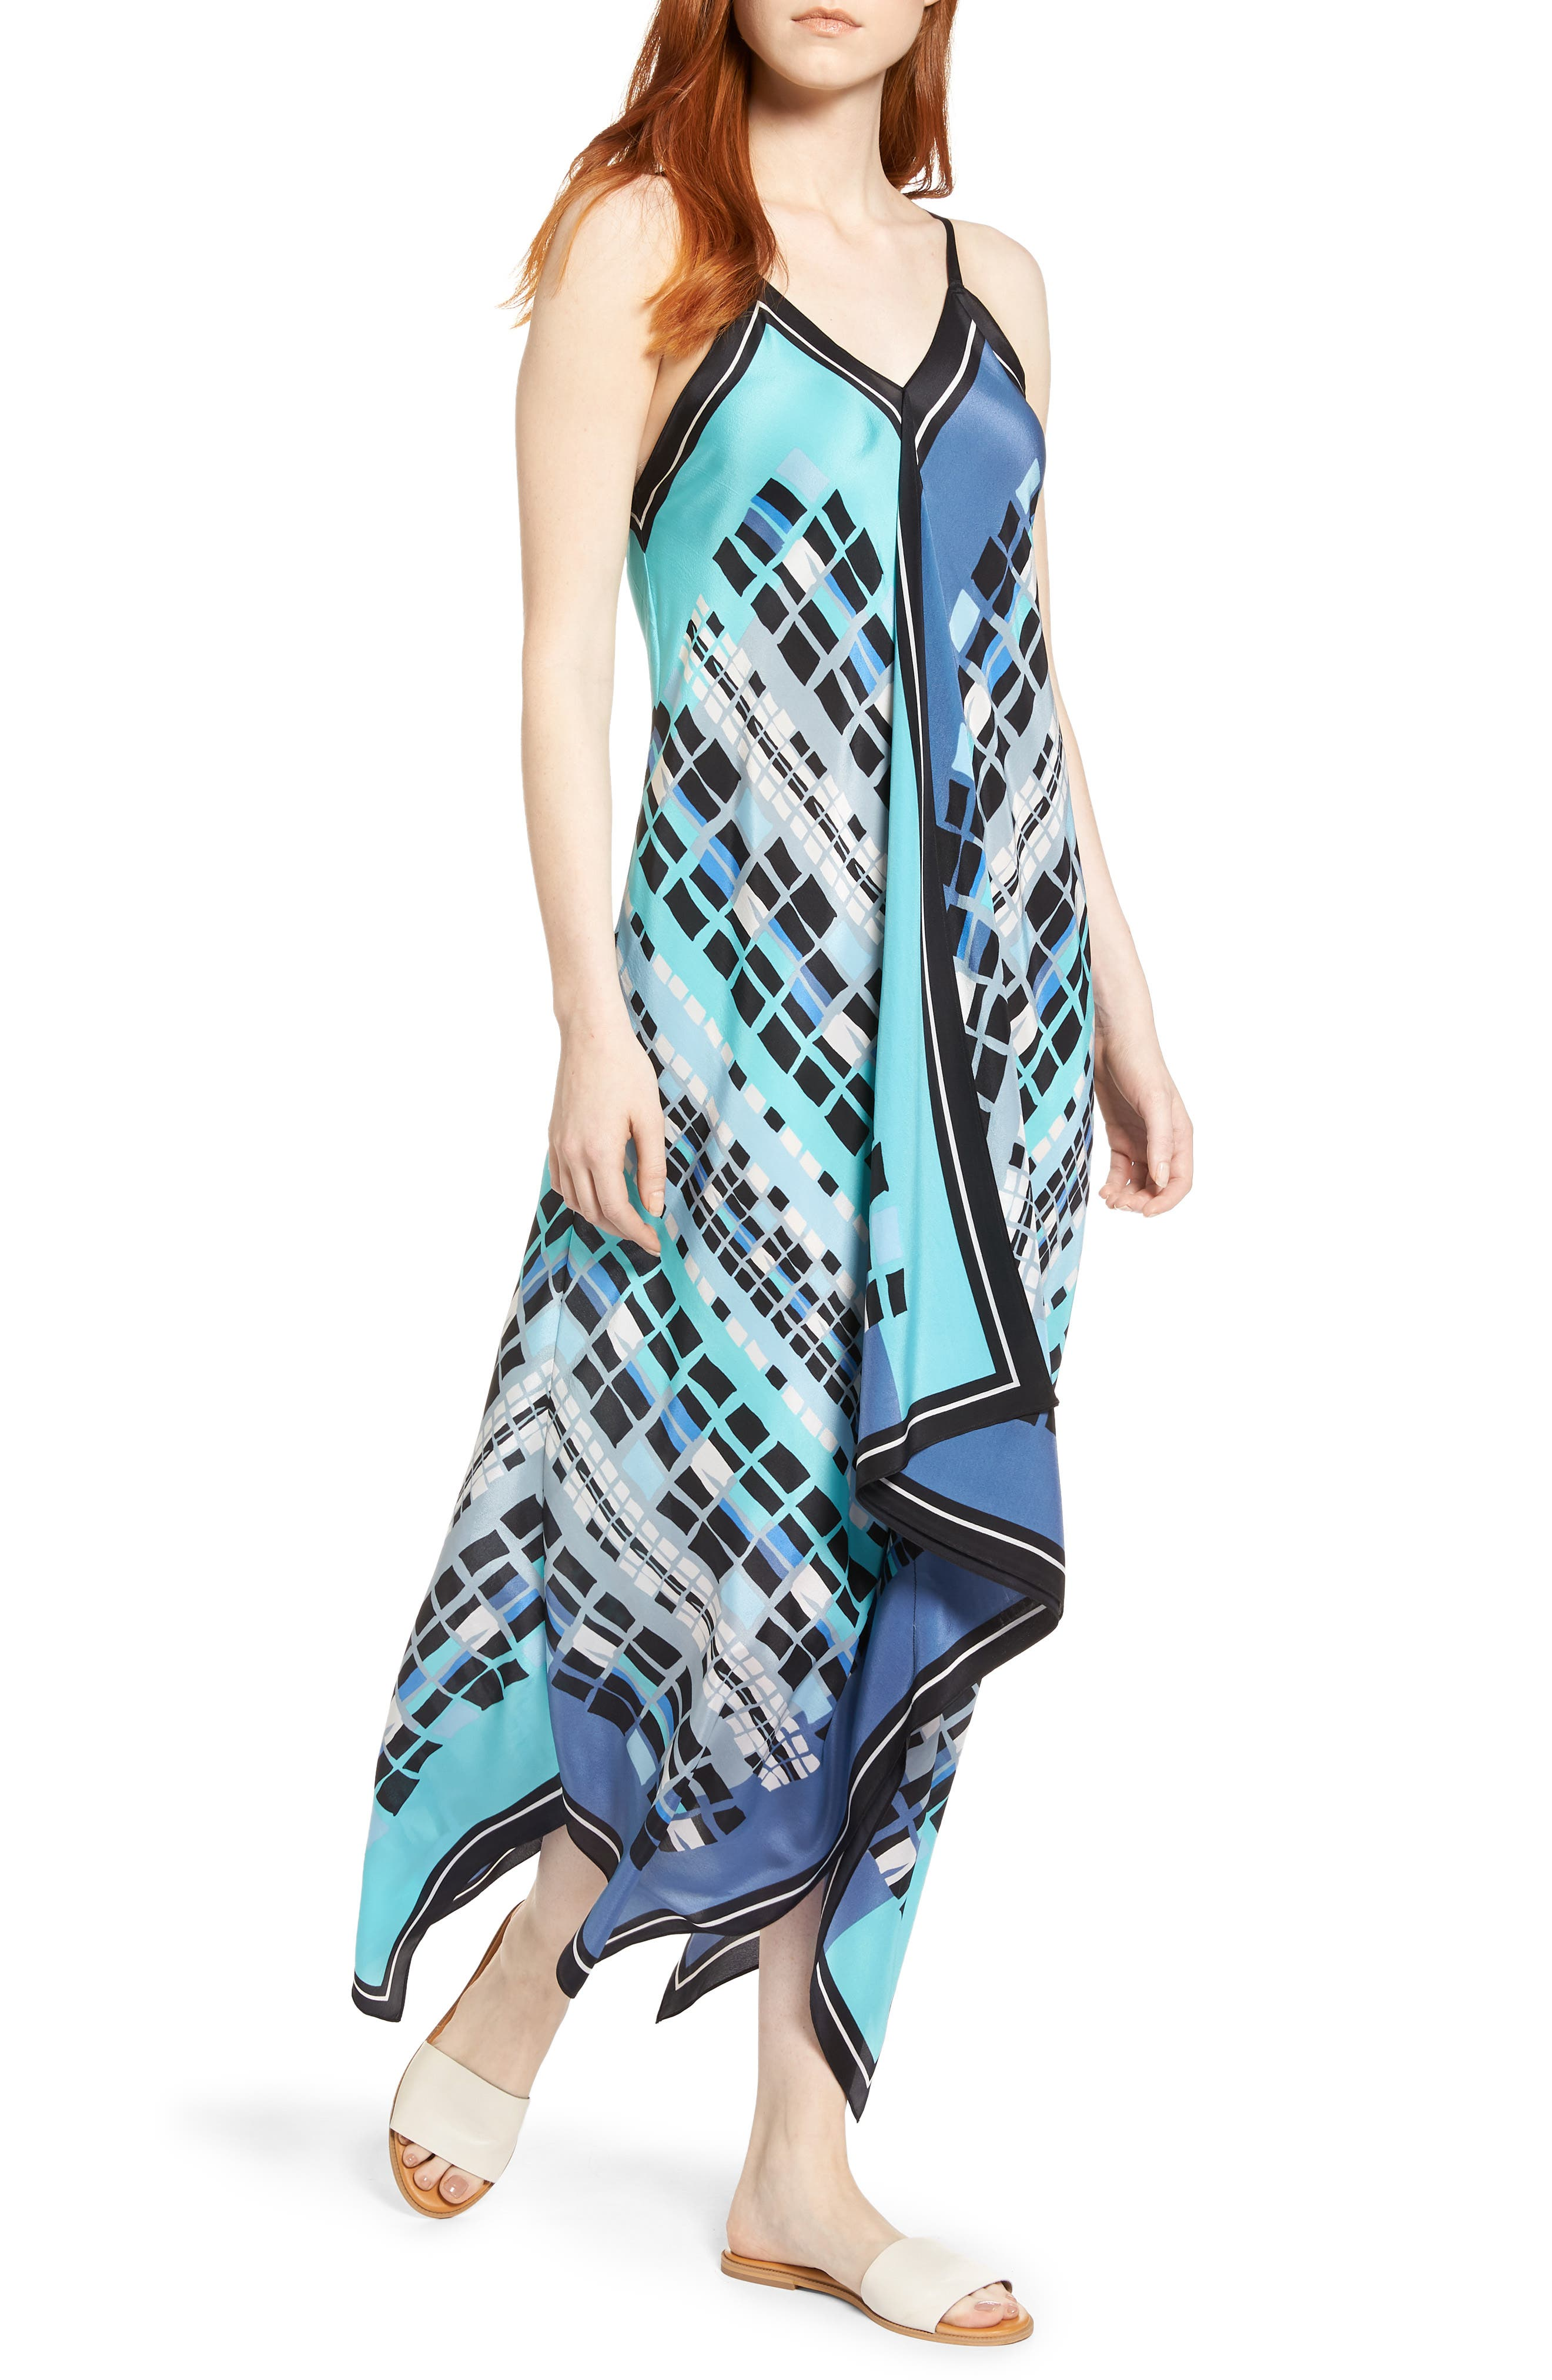 From Above Dress Silk Blend Maxi Dress,                             Main thumbnail 1, color,                             490